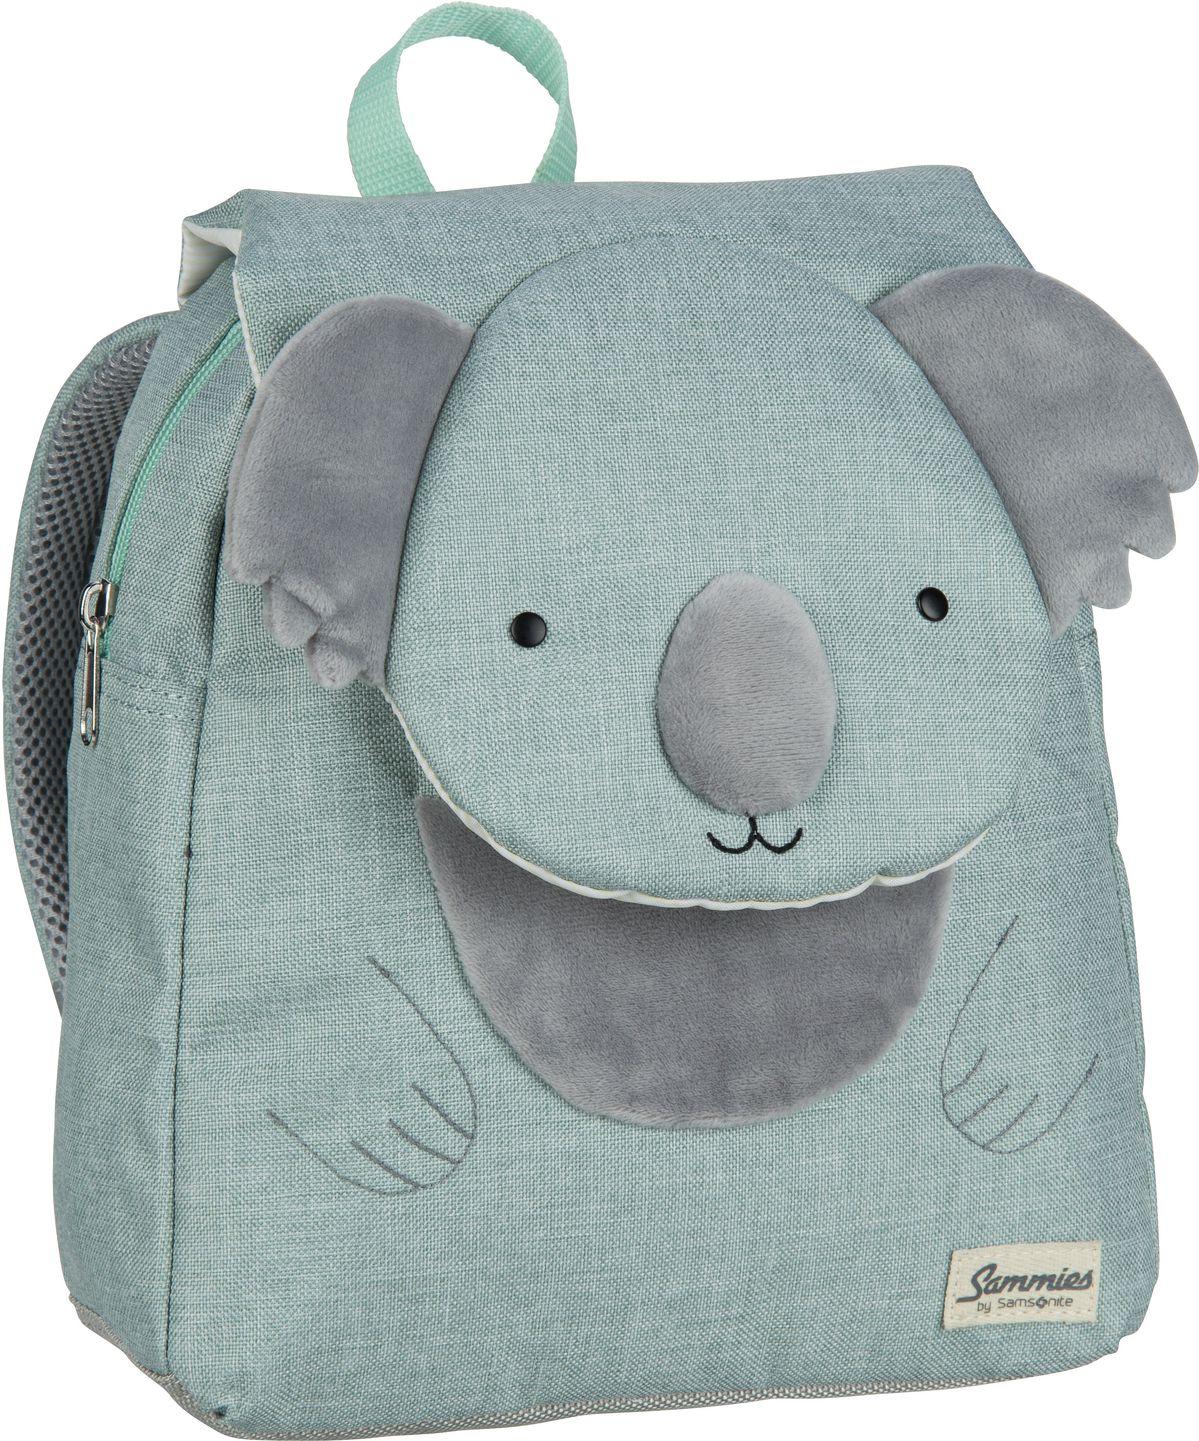 Rucksack / Daypack Happy Sammies Backpack S Koala Kody (7.5 Liter)